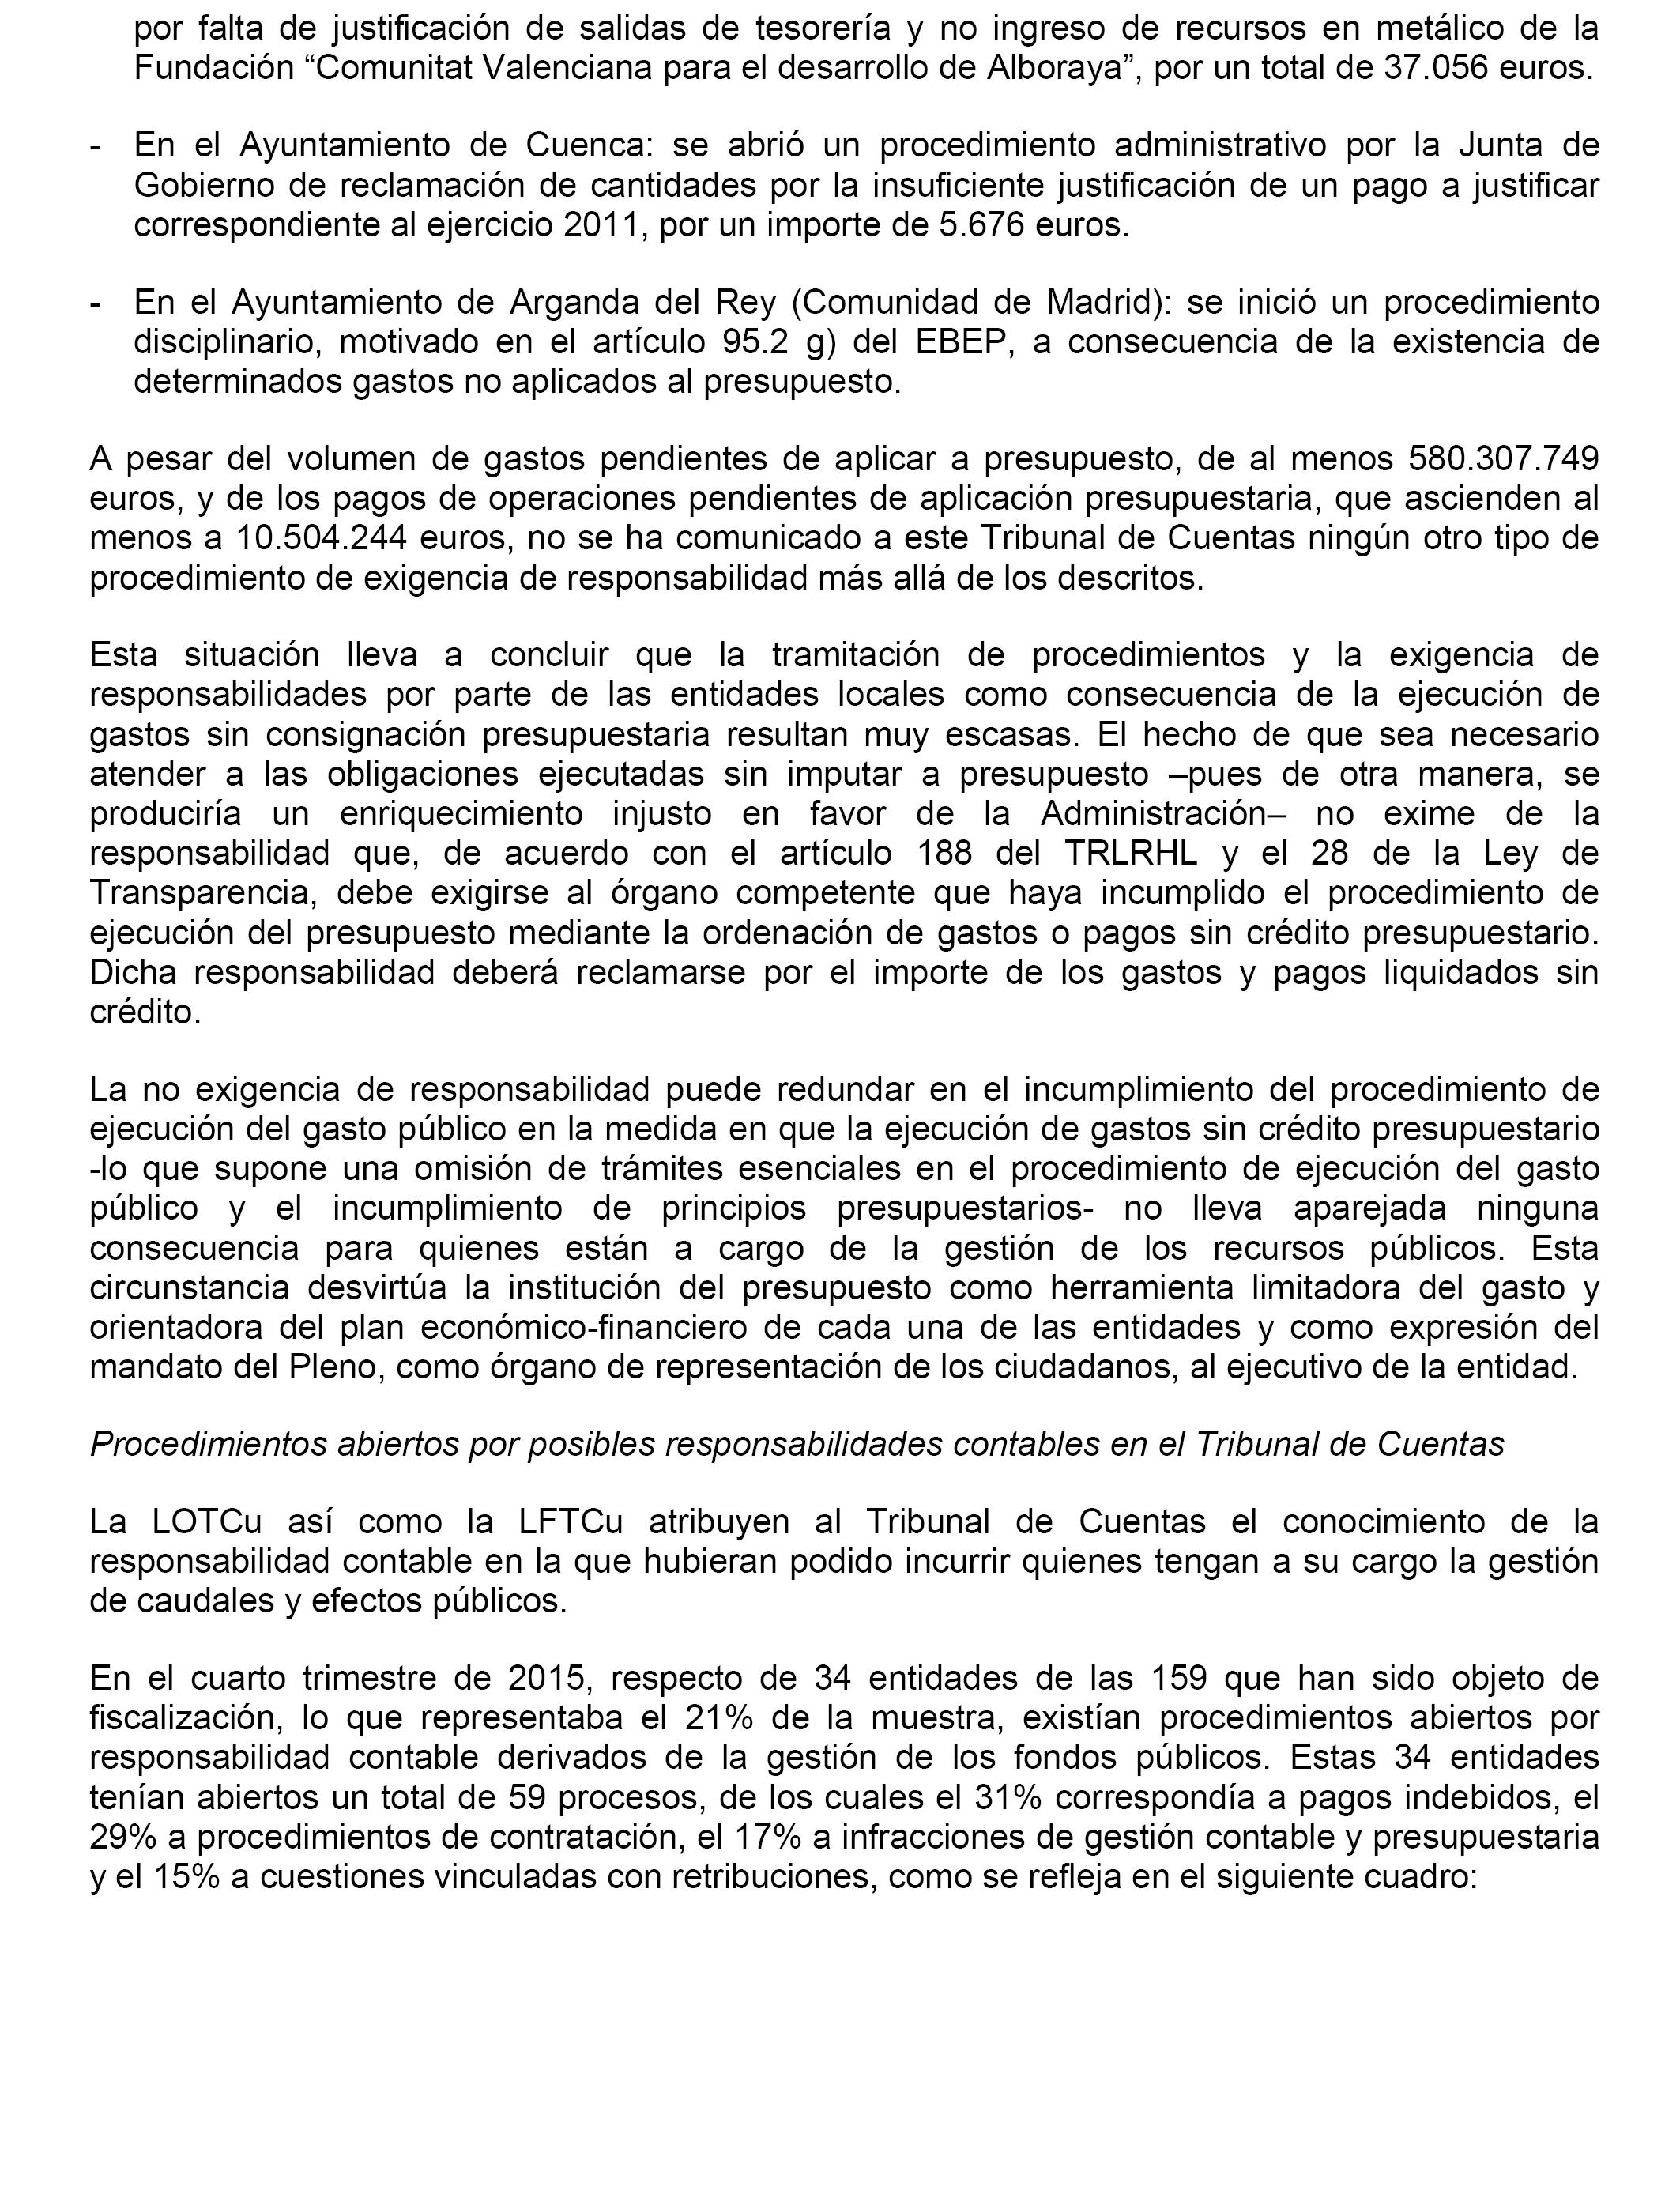 BOE.es - Documento BOE-A-2017-9403